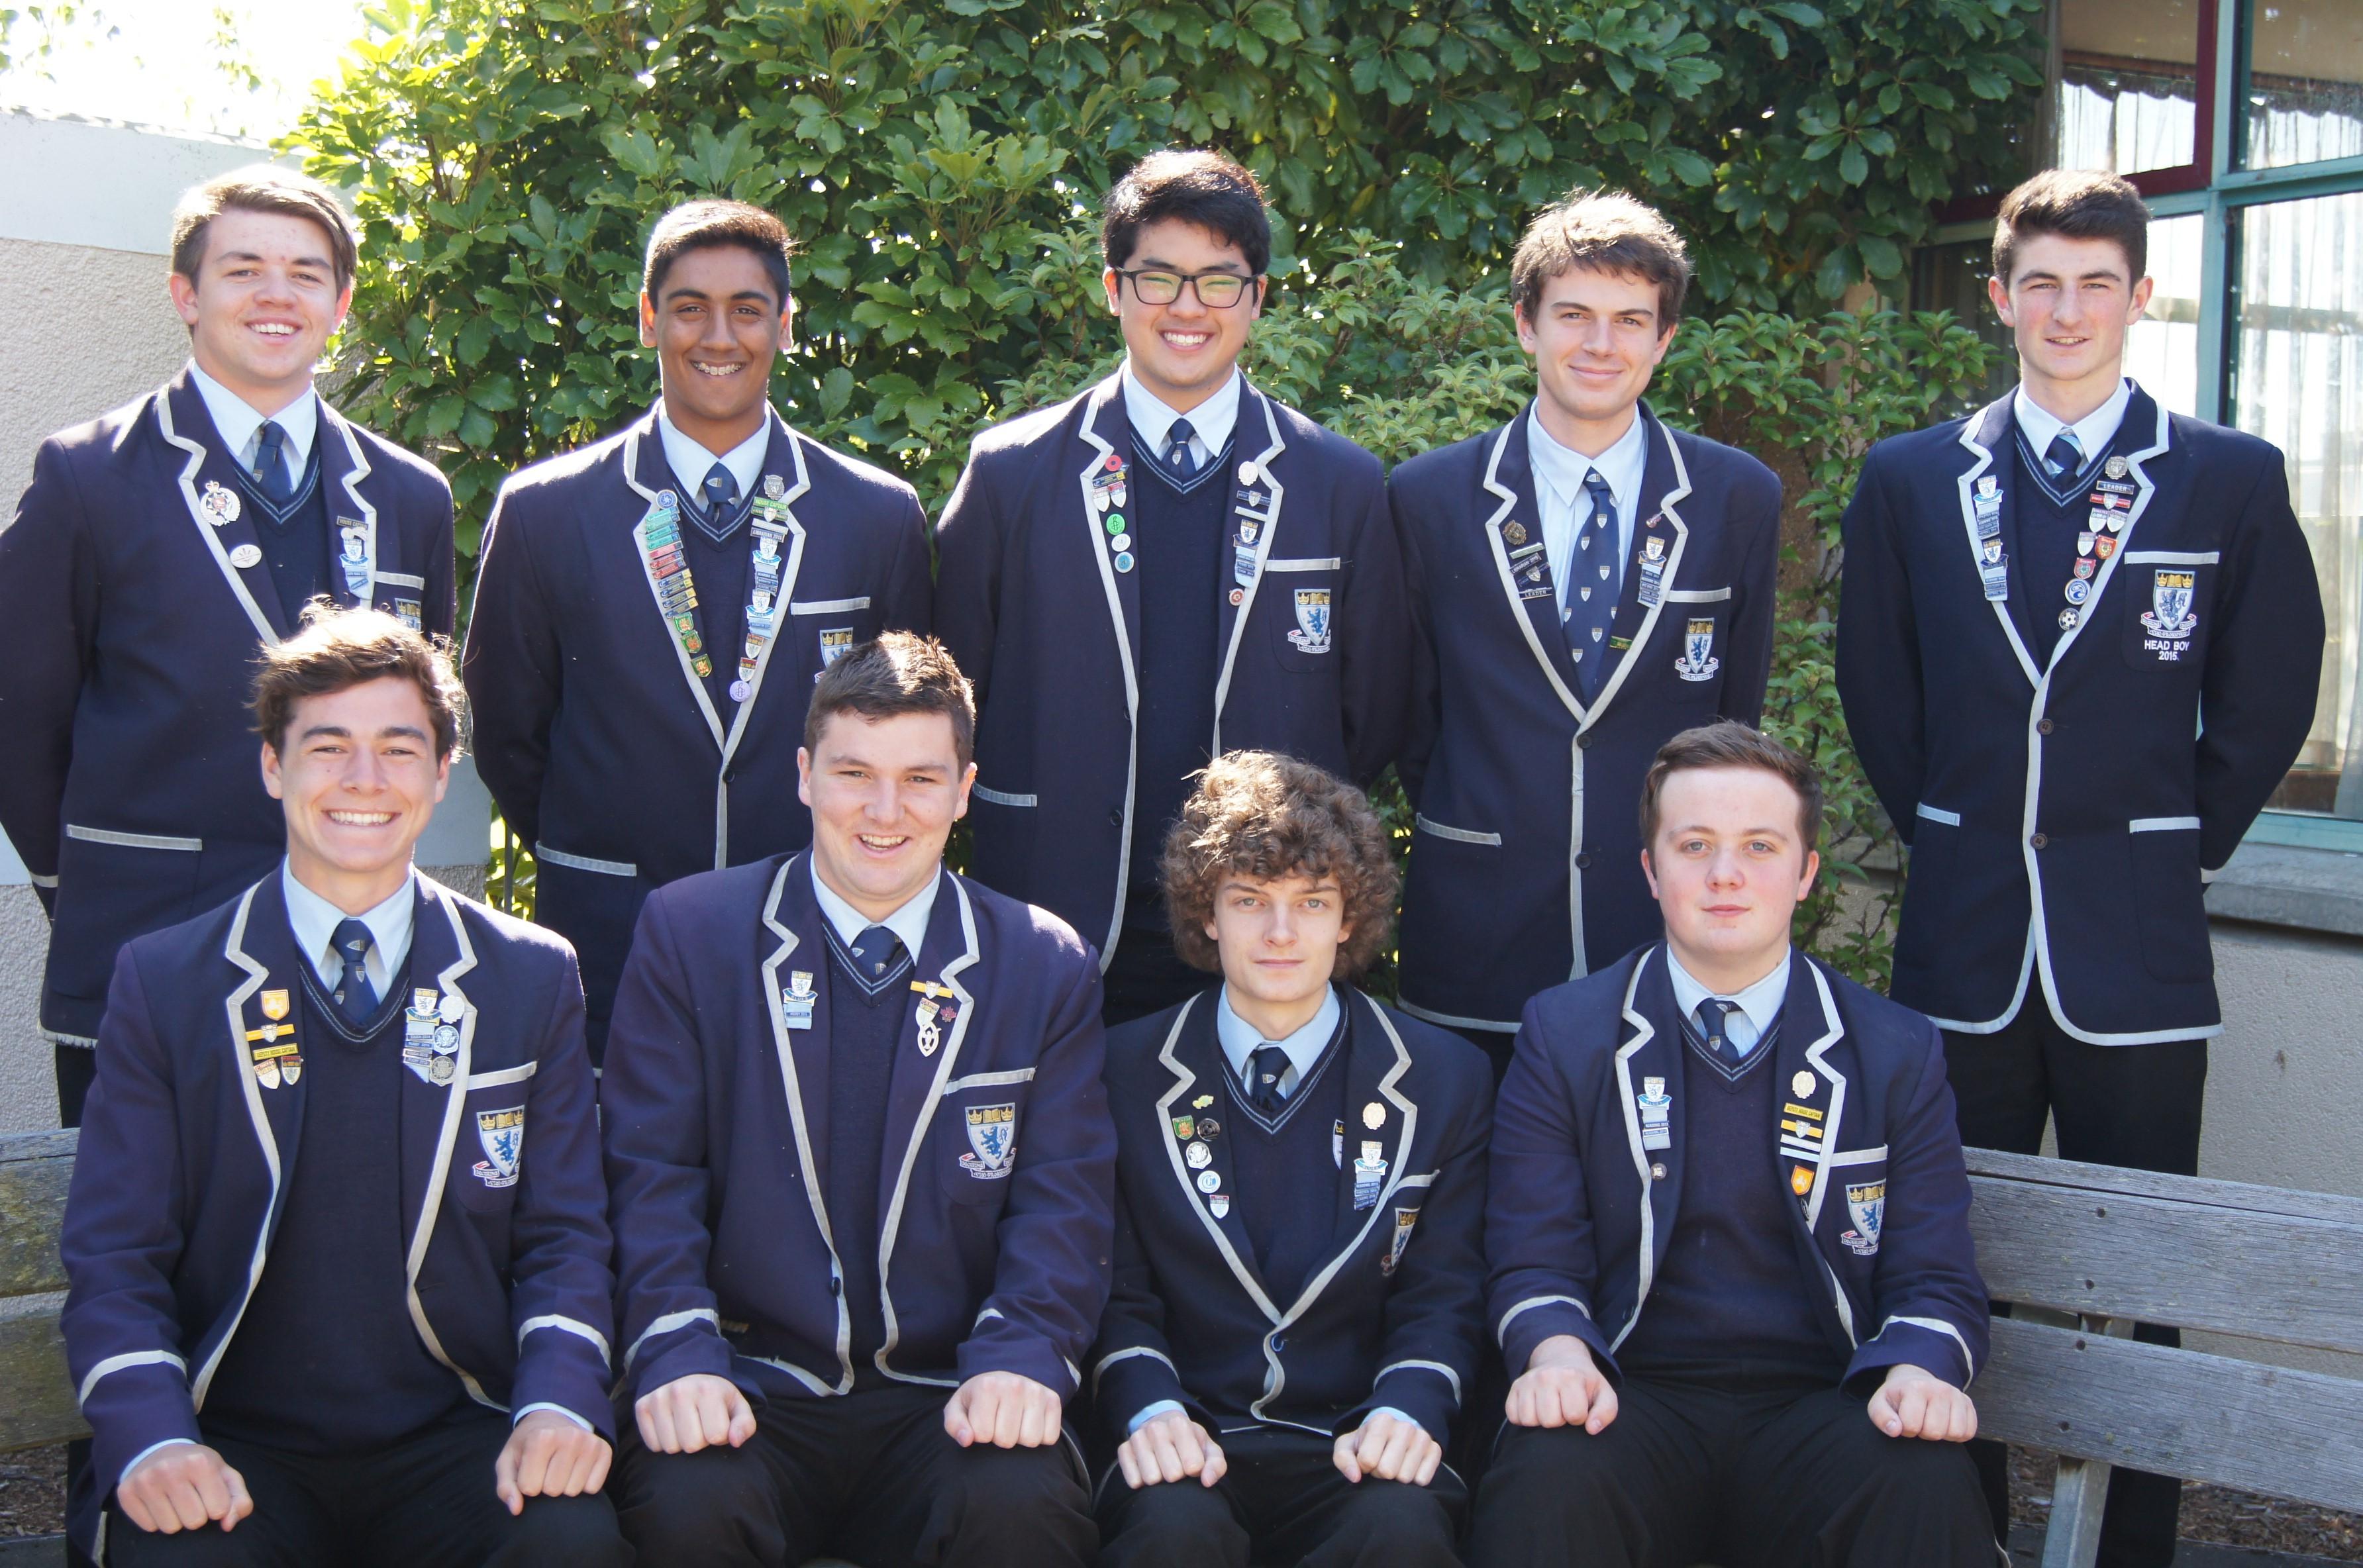 King's High School, Dunedin - Dunedin - mappnew.com